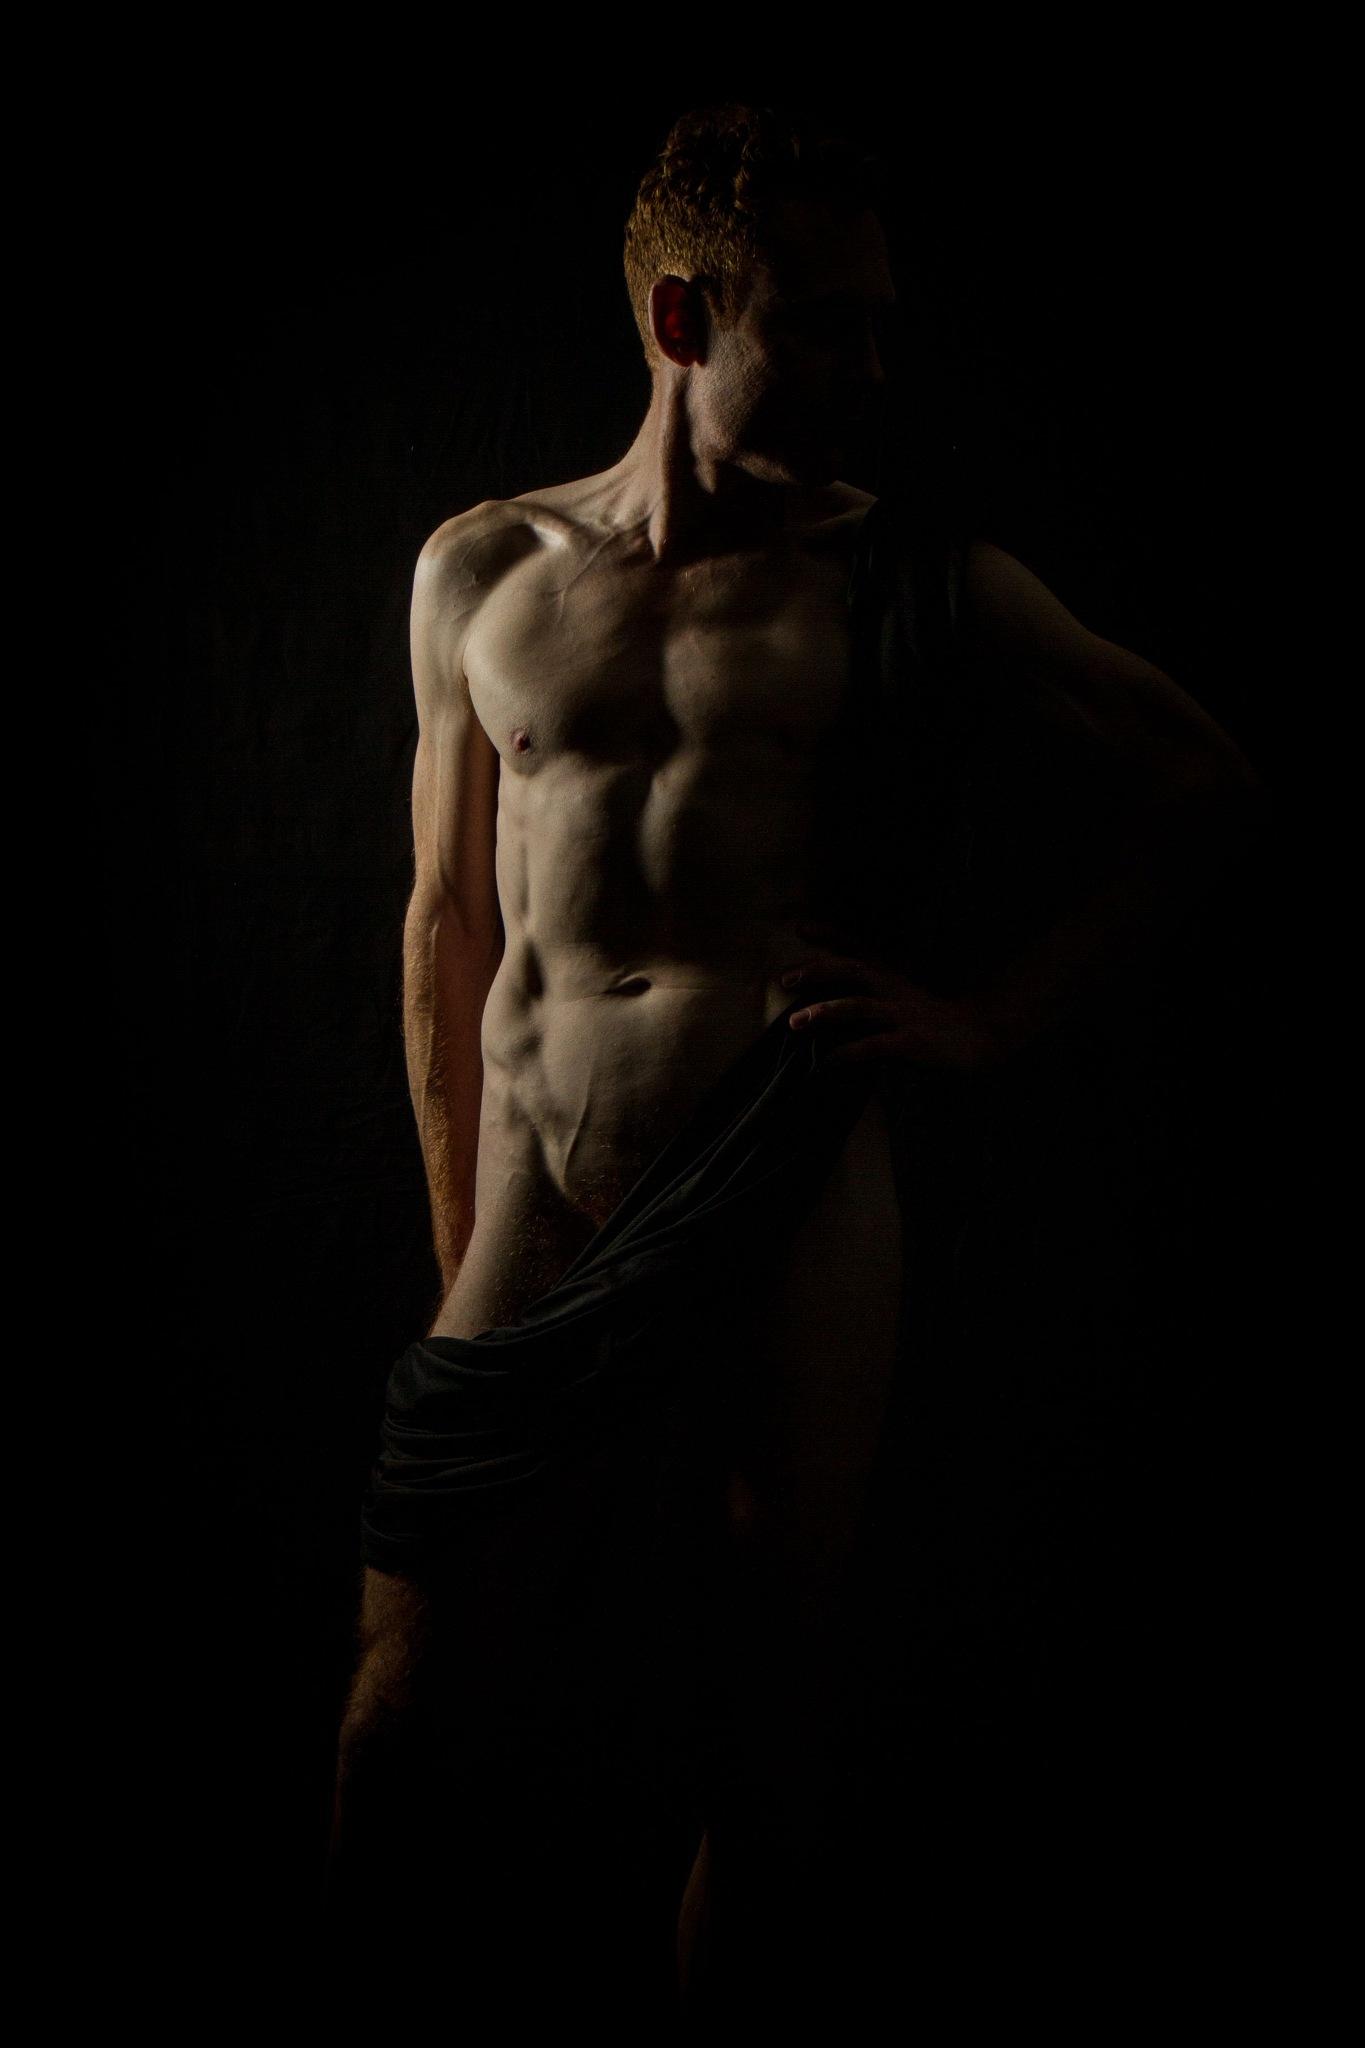 body in color by mr body shape